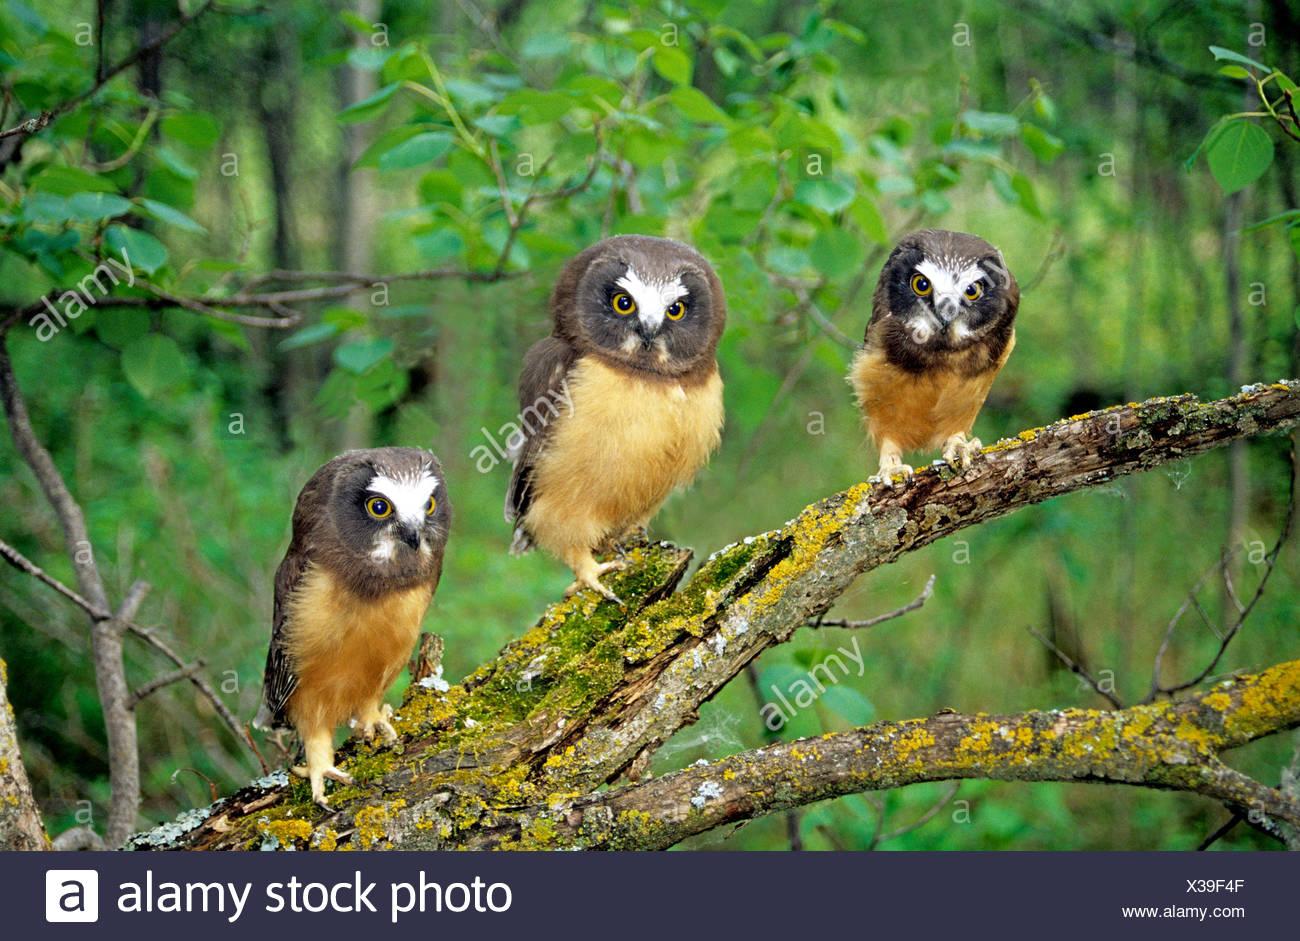 Northern saw-whet owl fledglings (Aegolius acadicus), Alberta, Canada. - Stock Image